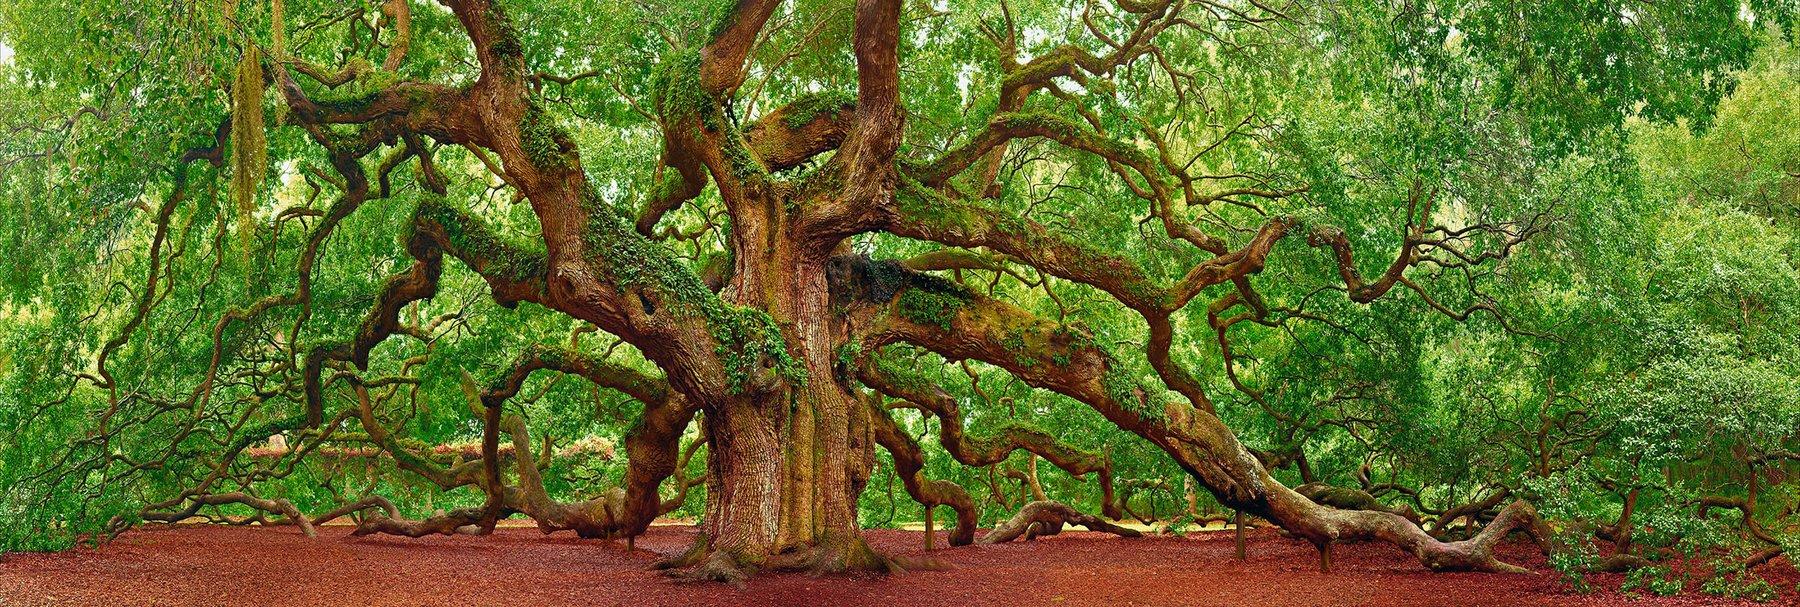 Peter Lik - Tree of Hope